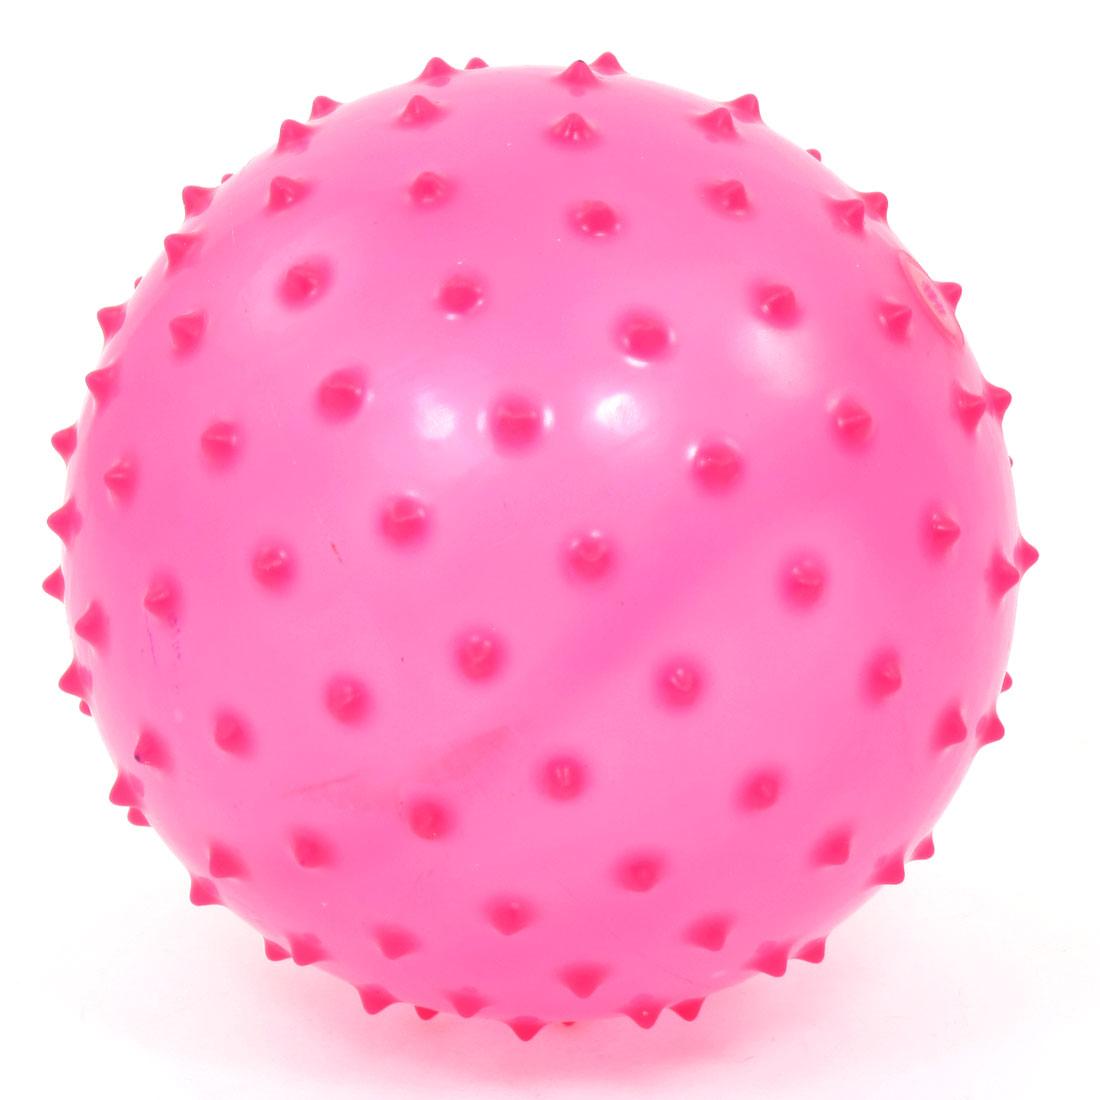 Magenta Inflatable Spiky Sensory Massage Ball Body Massager 14cm Dia